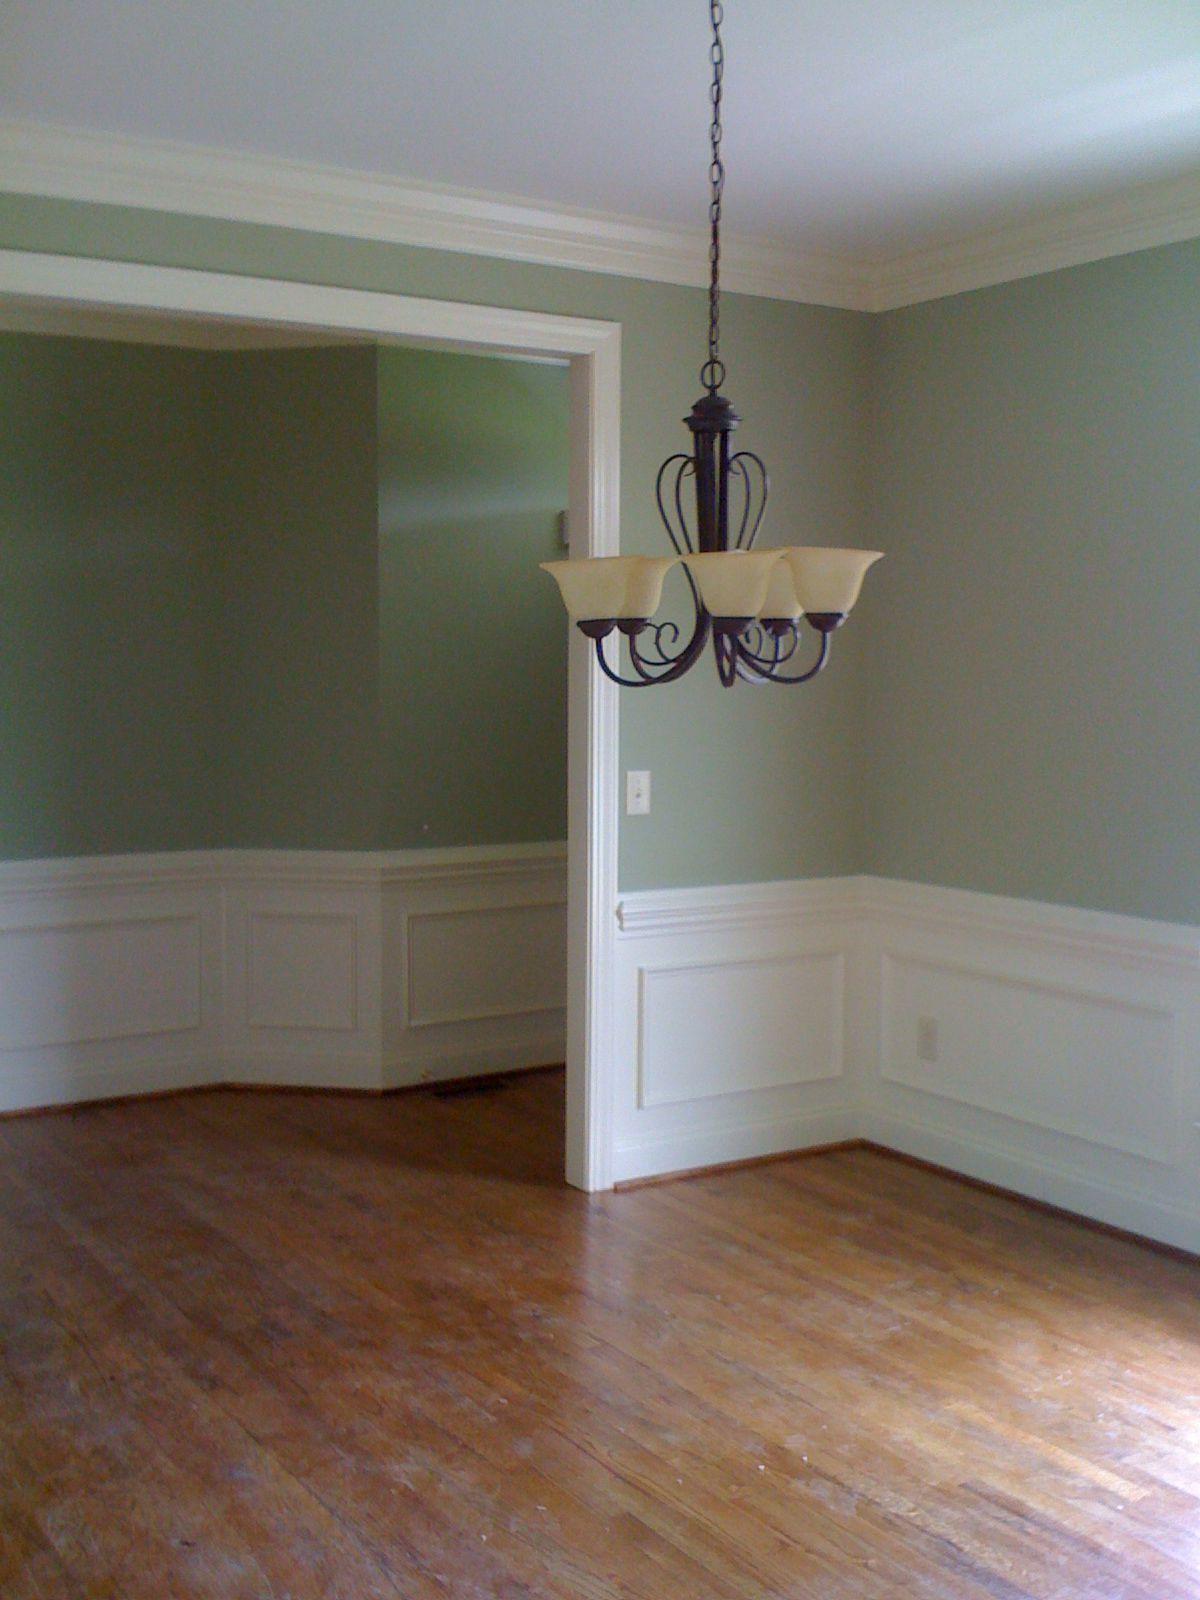 Sherwin Williams Softened Green and Dover White   Design   Pinterest